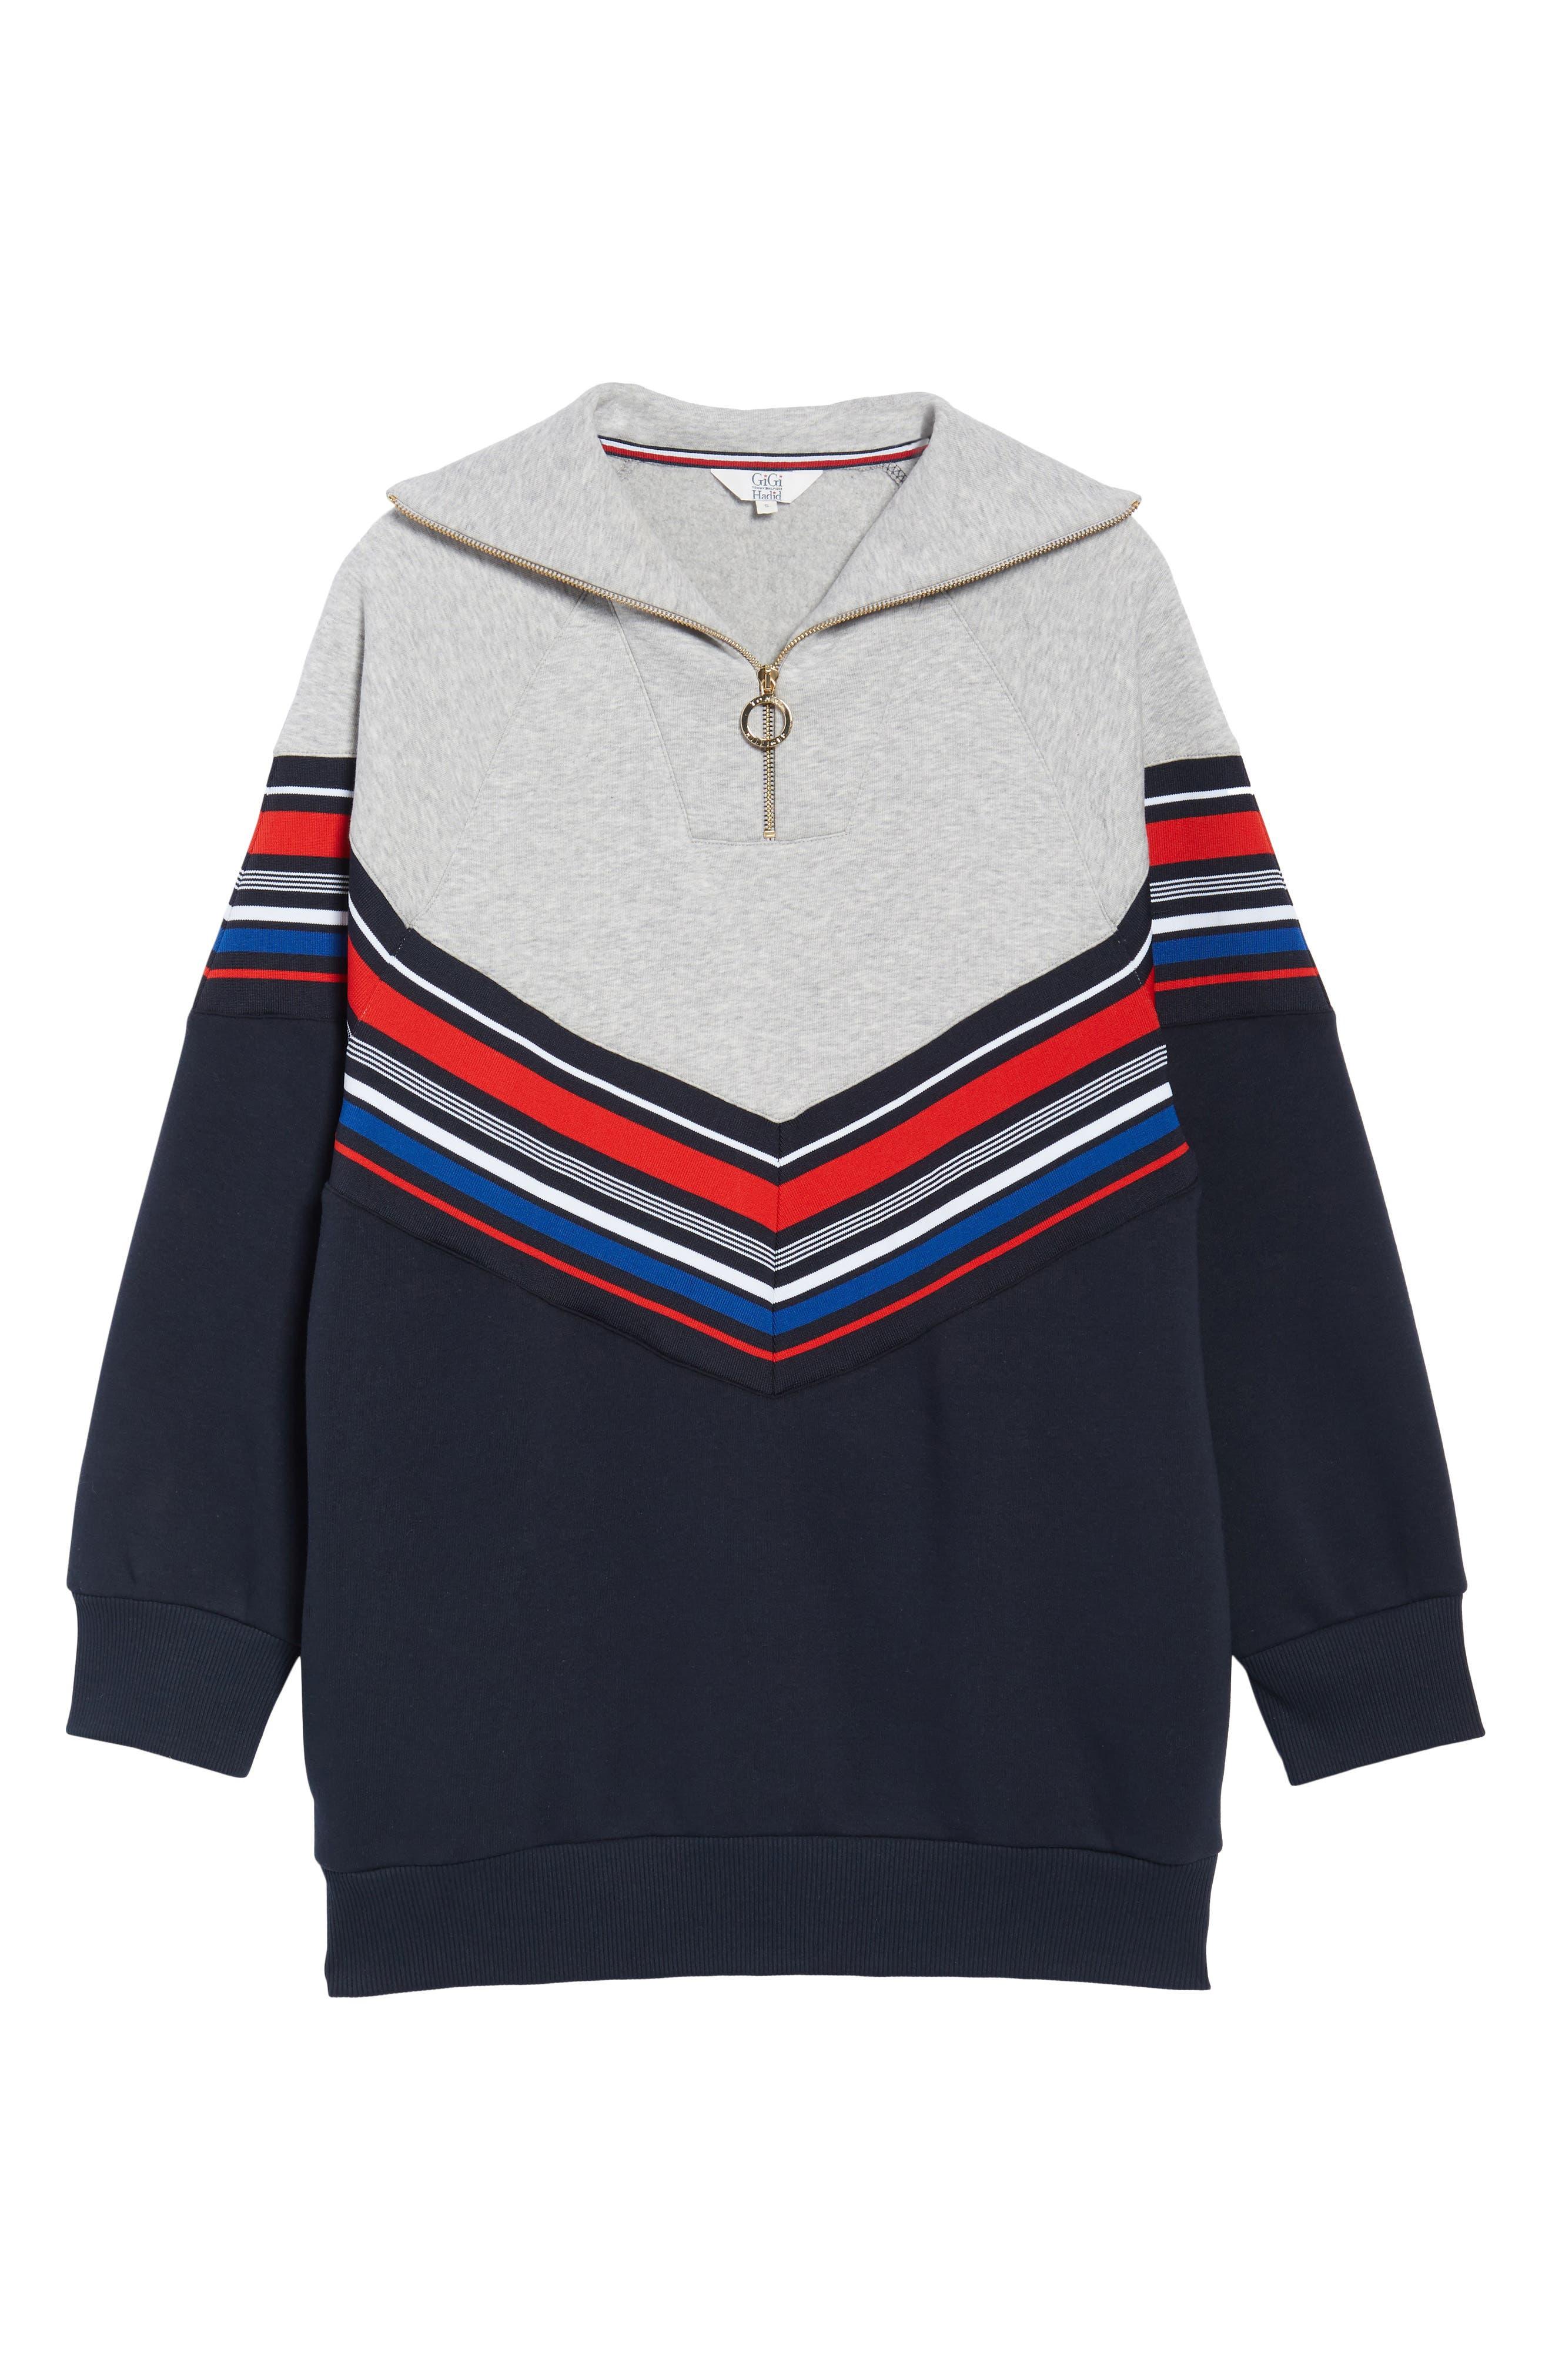 x Gigi Hadid Racing Sweatshirt Dress,                             Alternate thumbnail 6, color,                             405